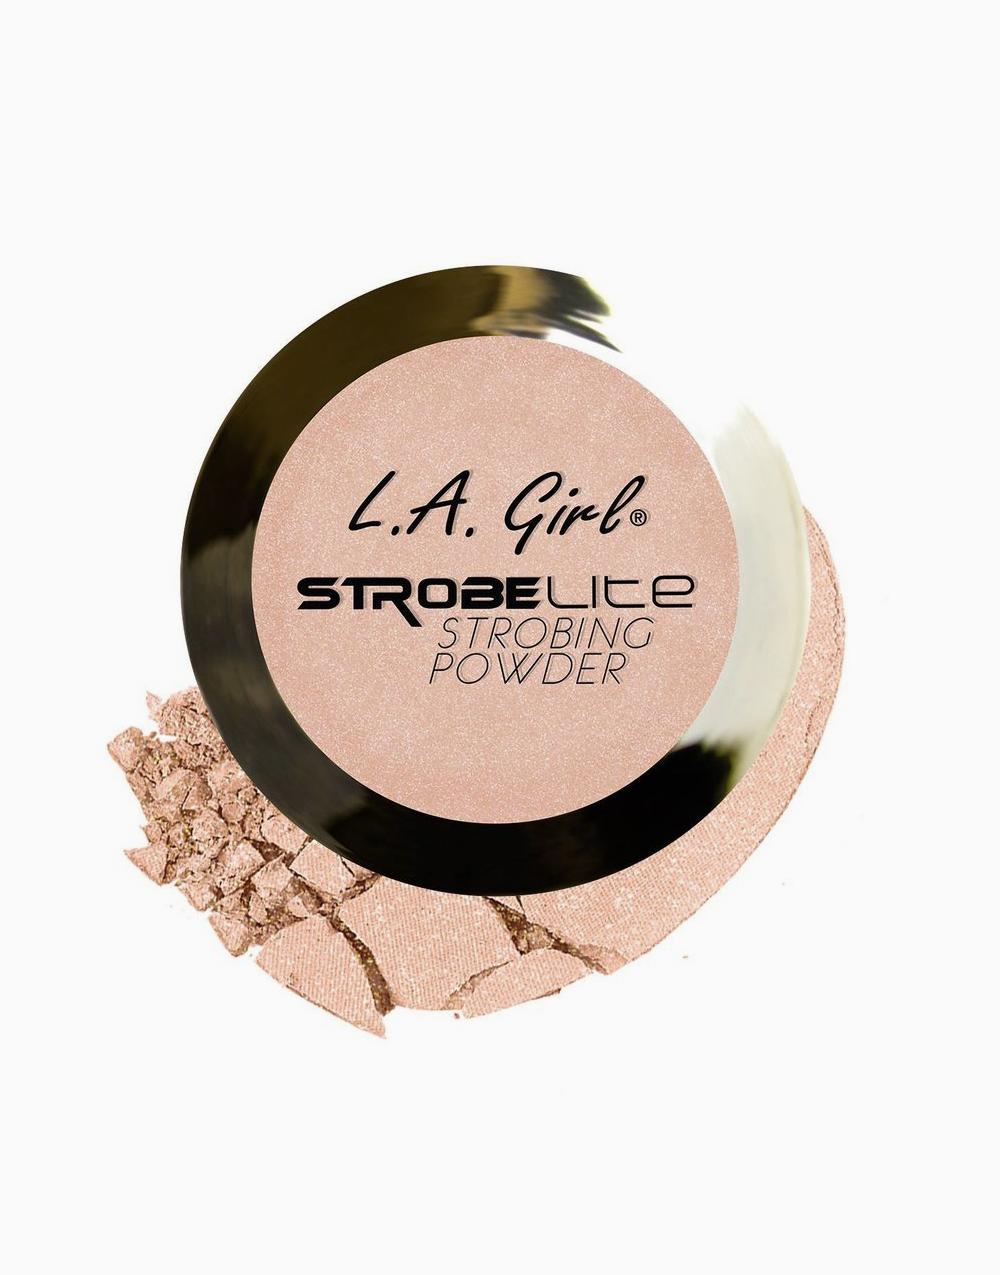 Strobelite Strobing Powder by L.A. Girl | 90 WATT